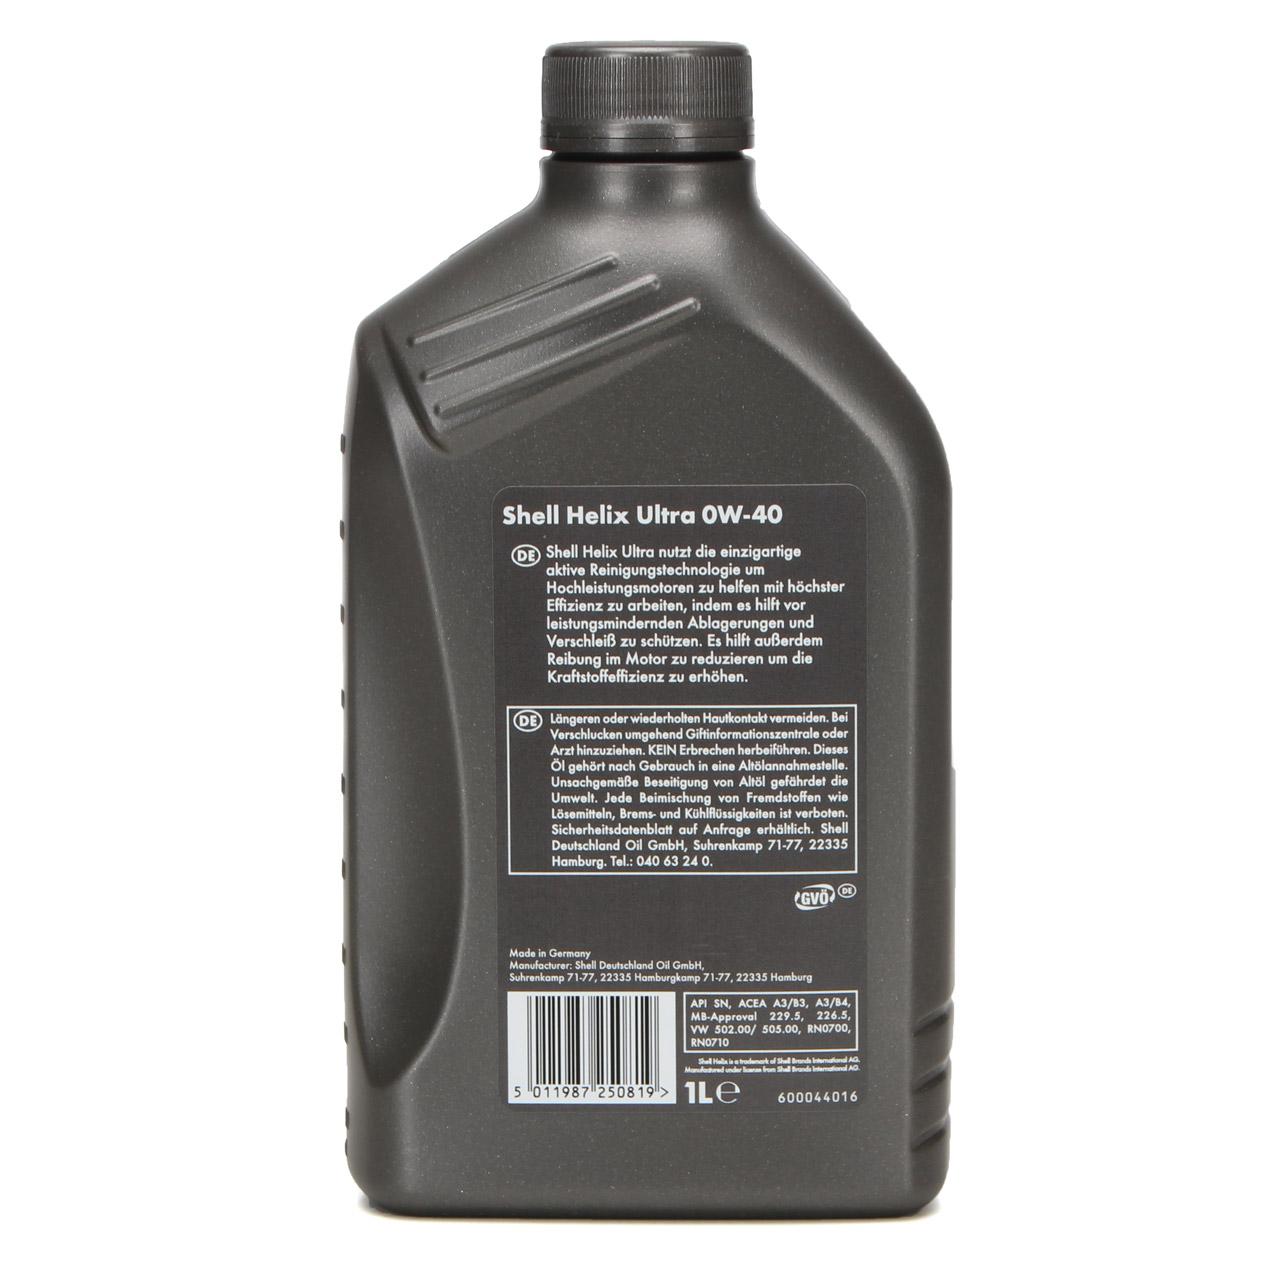 SHELL Motoröl Öl HELIX ULTRA 0W40 MB 229.5/226.5 VW 502.00/505.00 - 1L 1 Liter